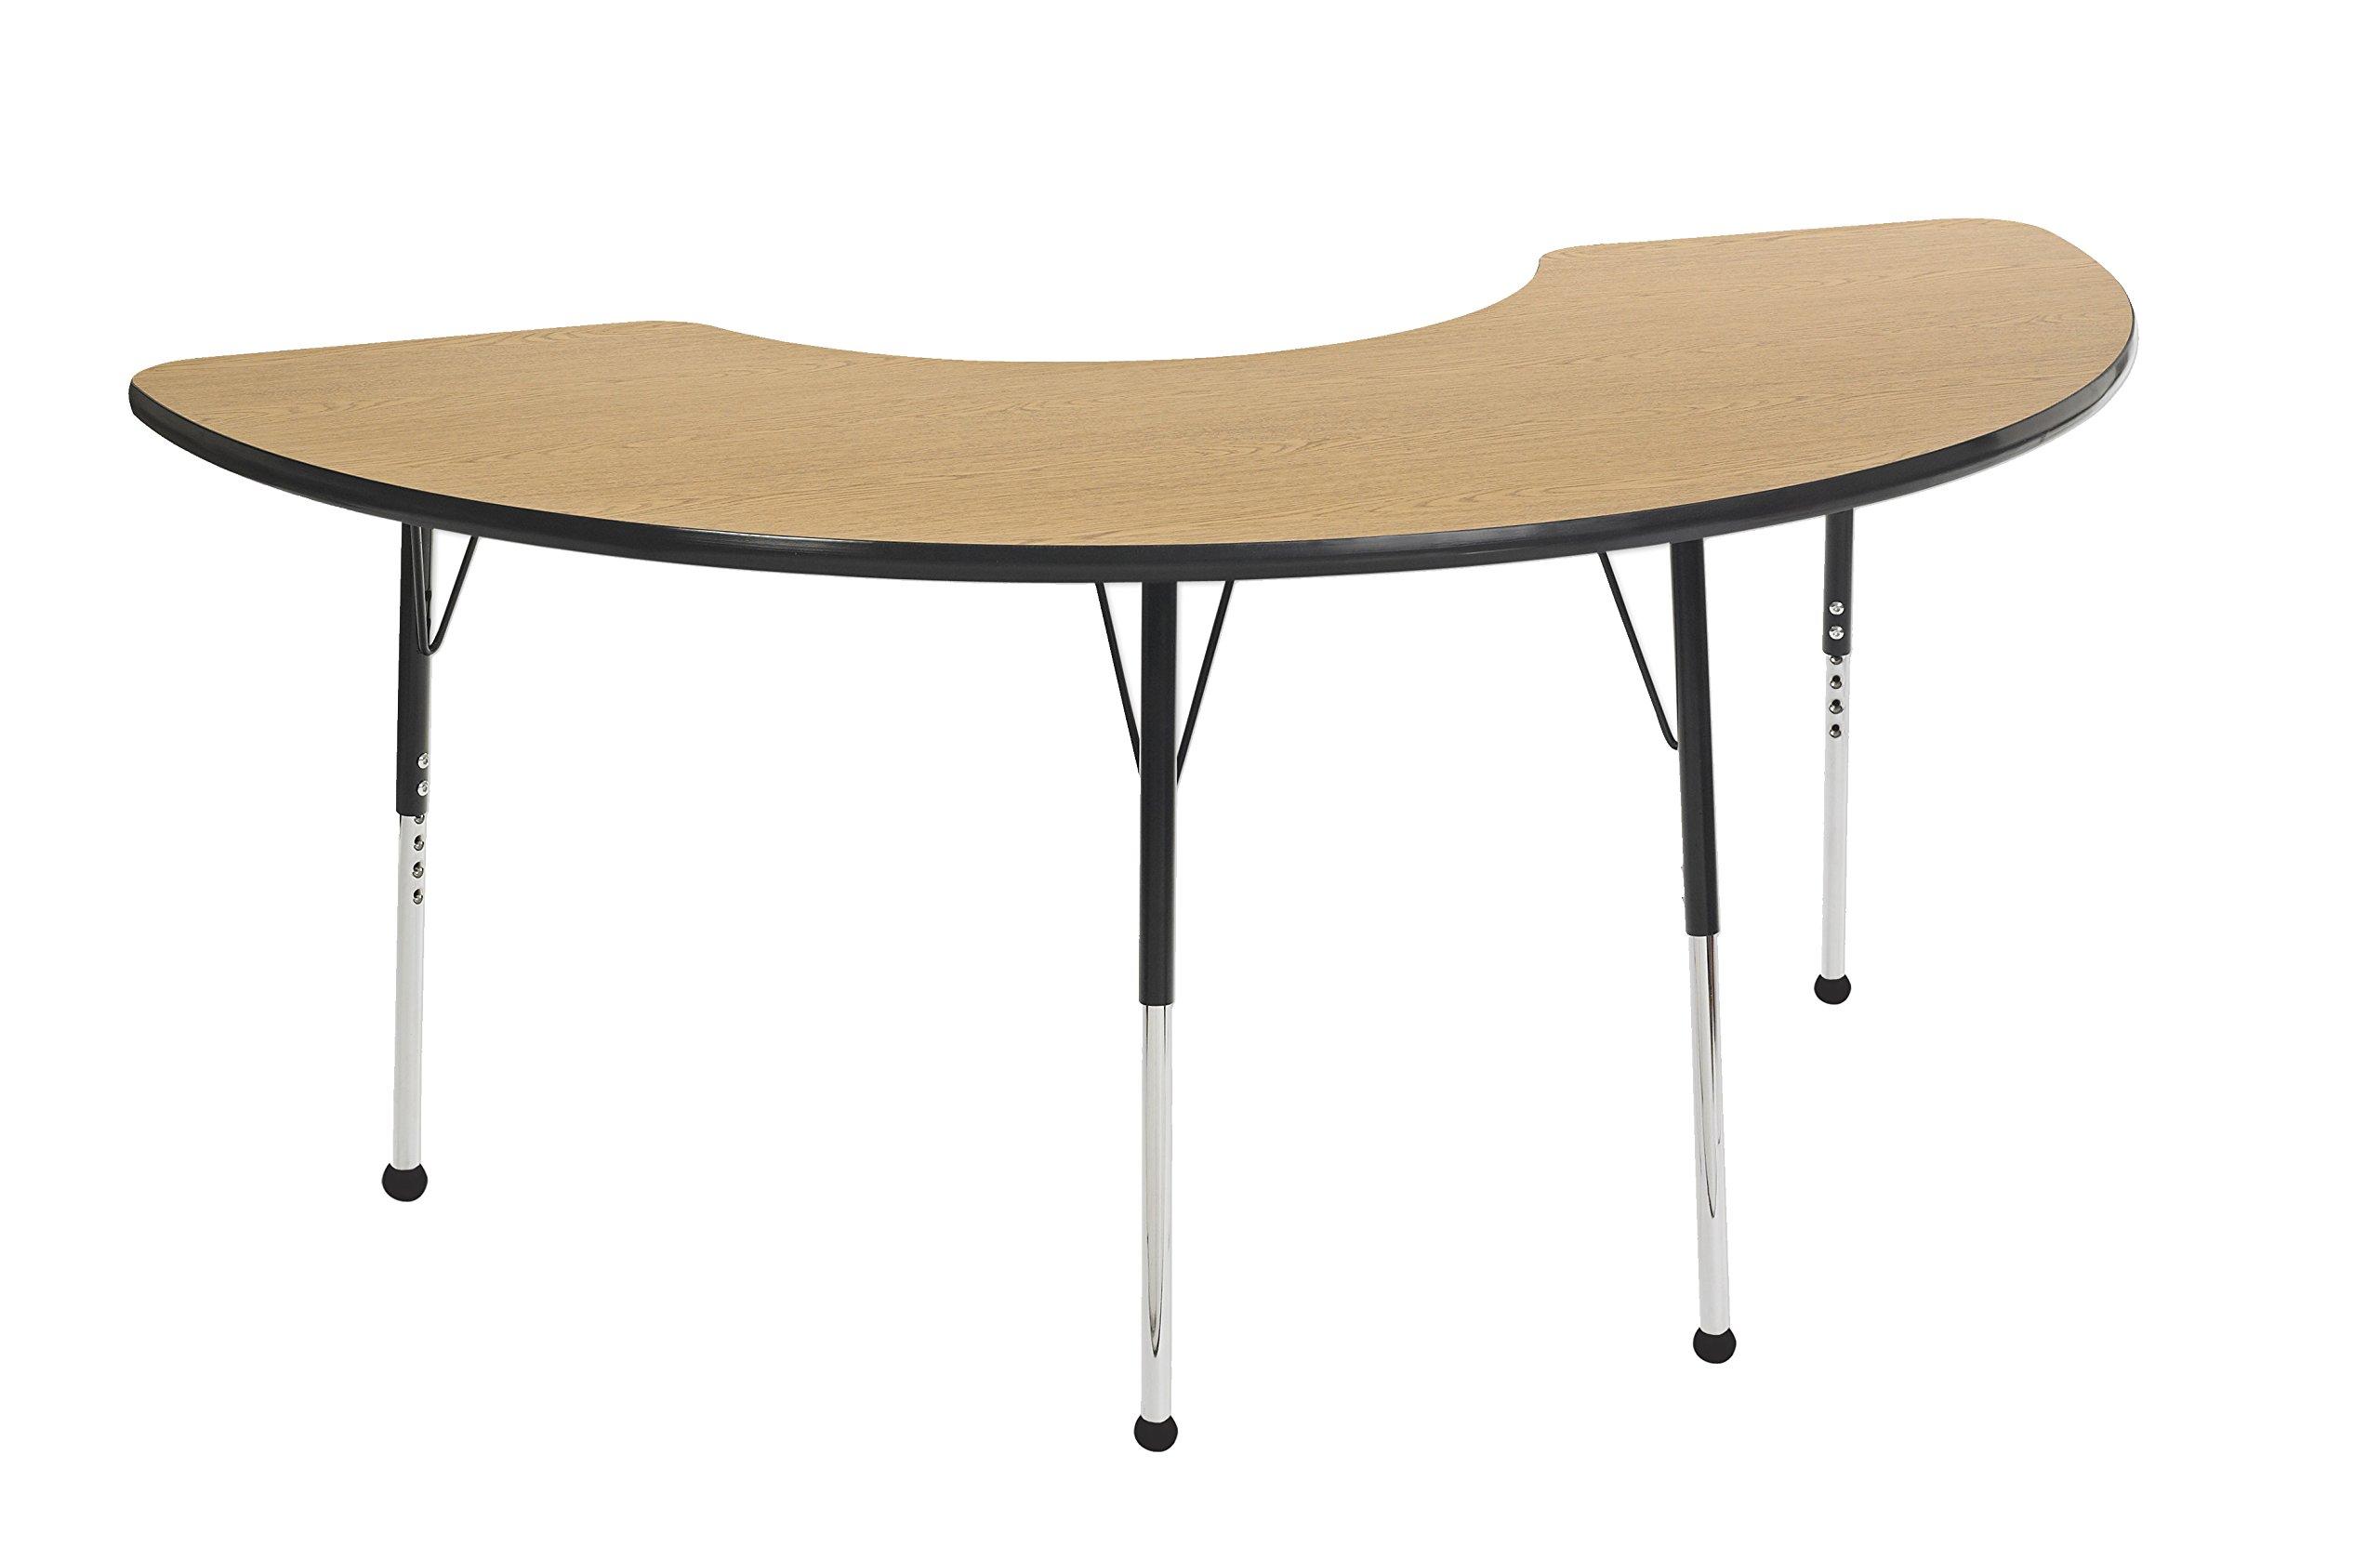 ECR4Kids 36'' x 72'' Half Moon  Activty School Table, Standard Legs w/Ball Glides, Adjustable Height 19-30 inch (Oak/Black)